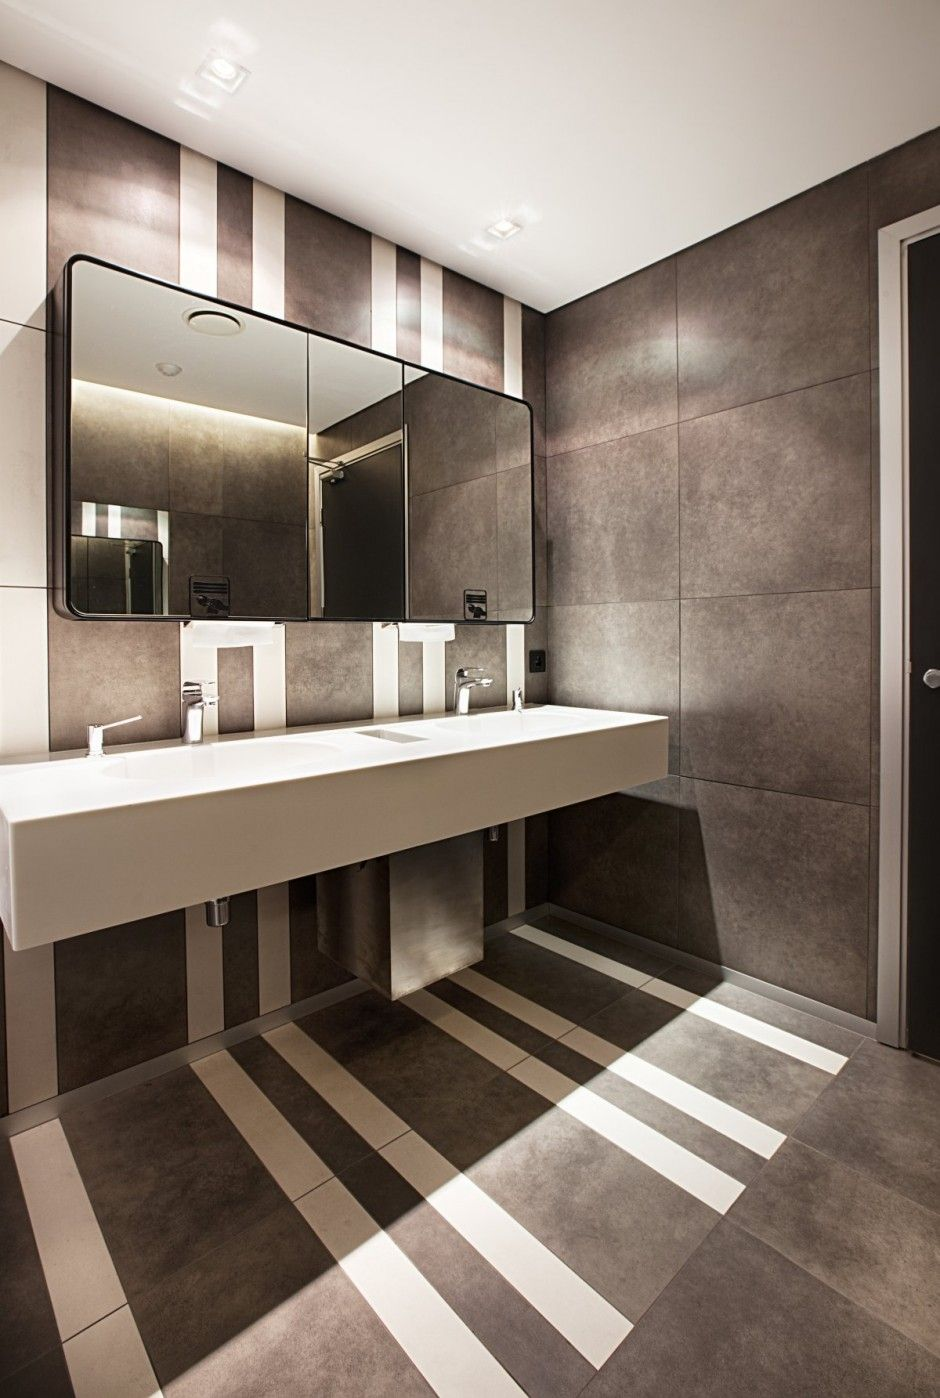 Turkcell maltepe plaza by mimaristudio bathroom ideas for Sanitaire salle de bain